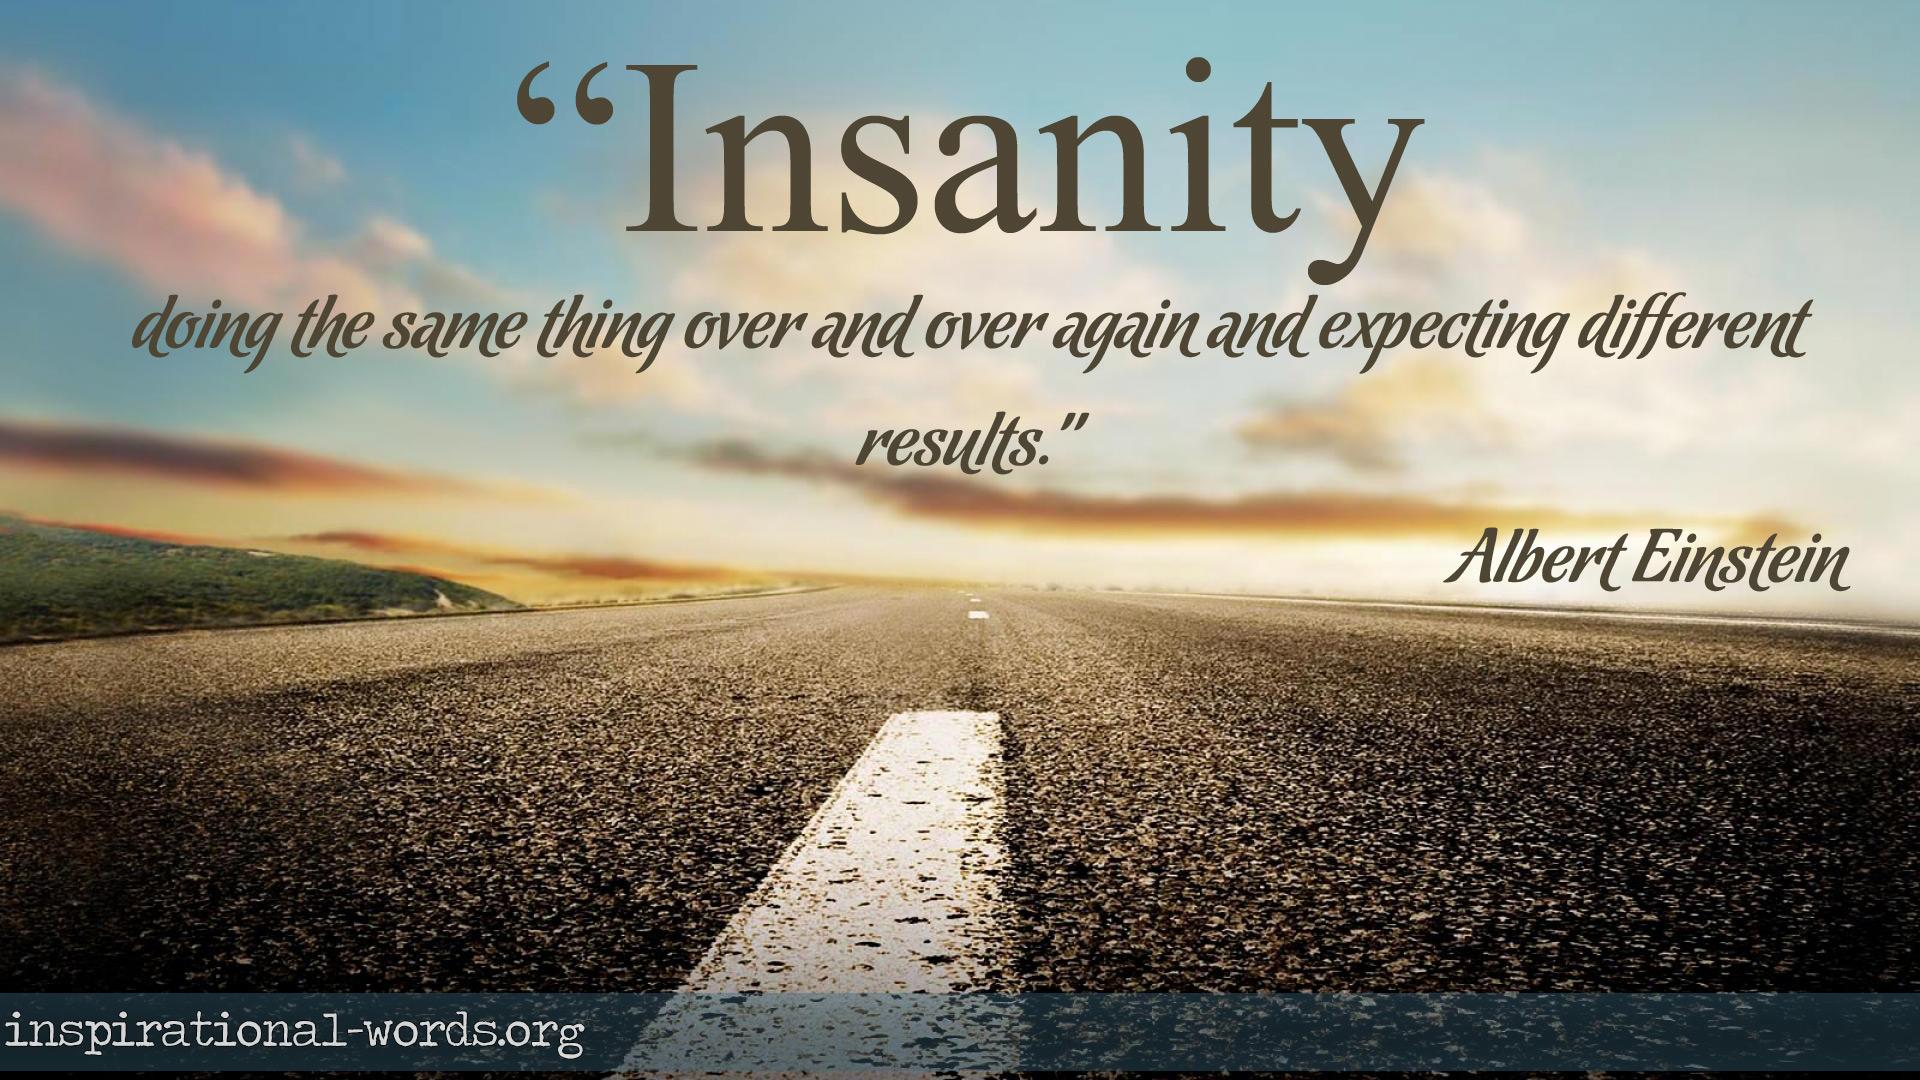 Scripture Quotes Desktop Wallpaper Inspiration Quotes Inspiring Words Quotesgram